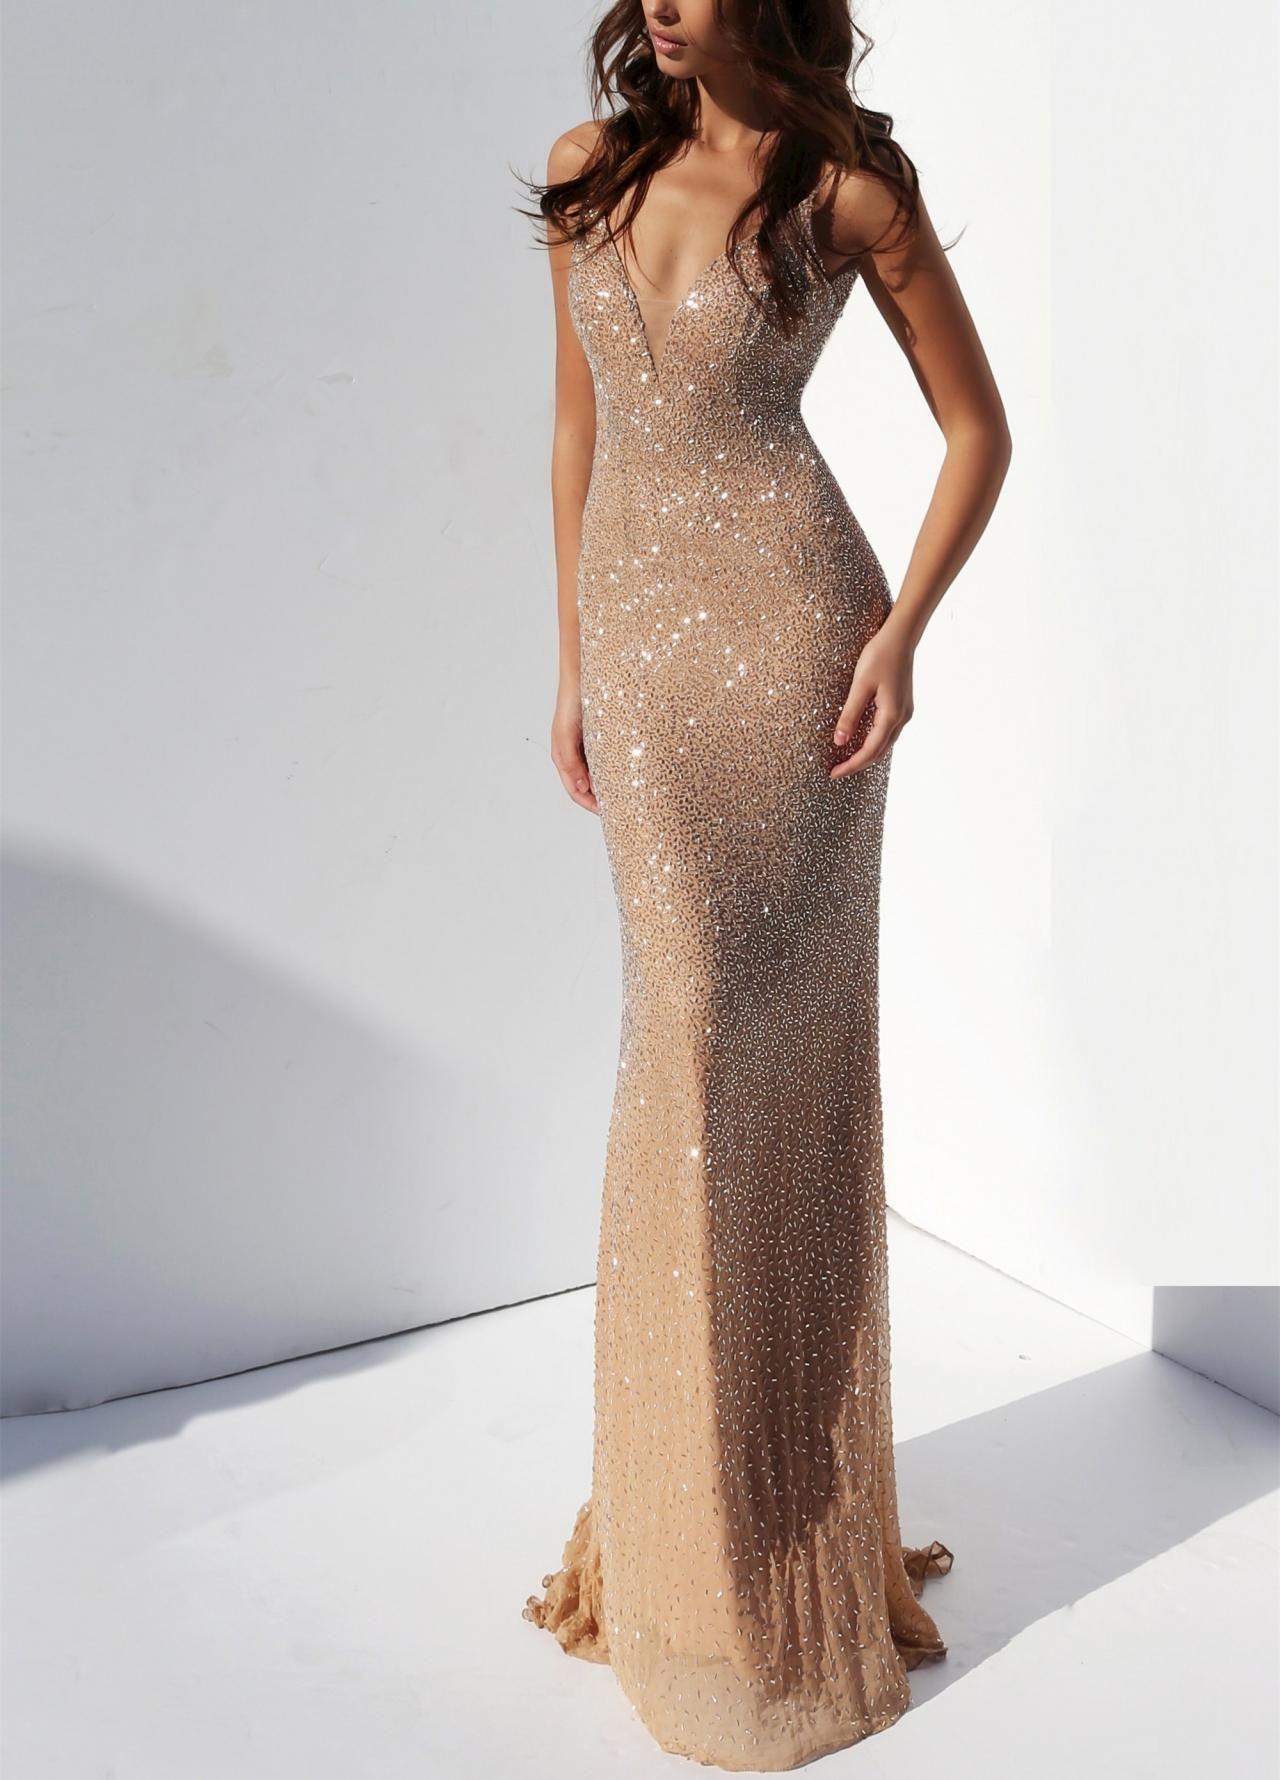 3342b11afb93 Spaghetti Straps V-neck Mermaid Floor Length Prom Dress,Evening Dress